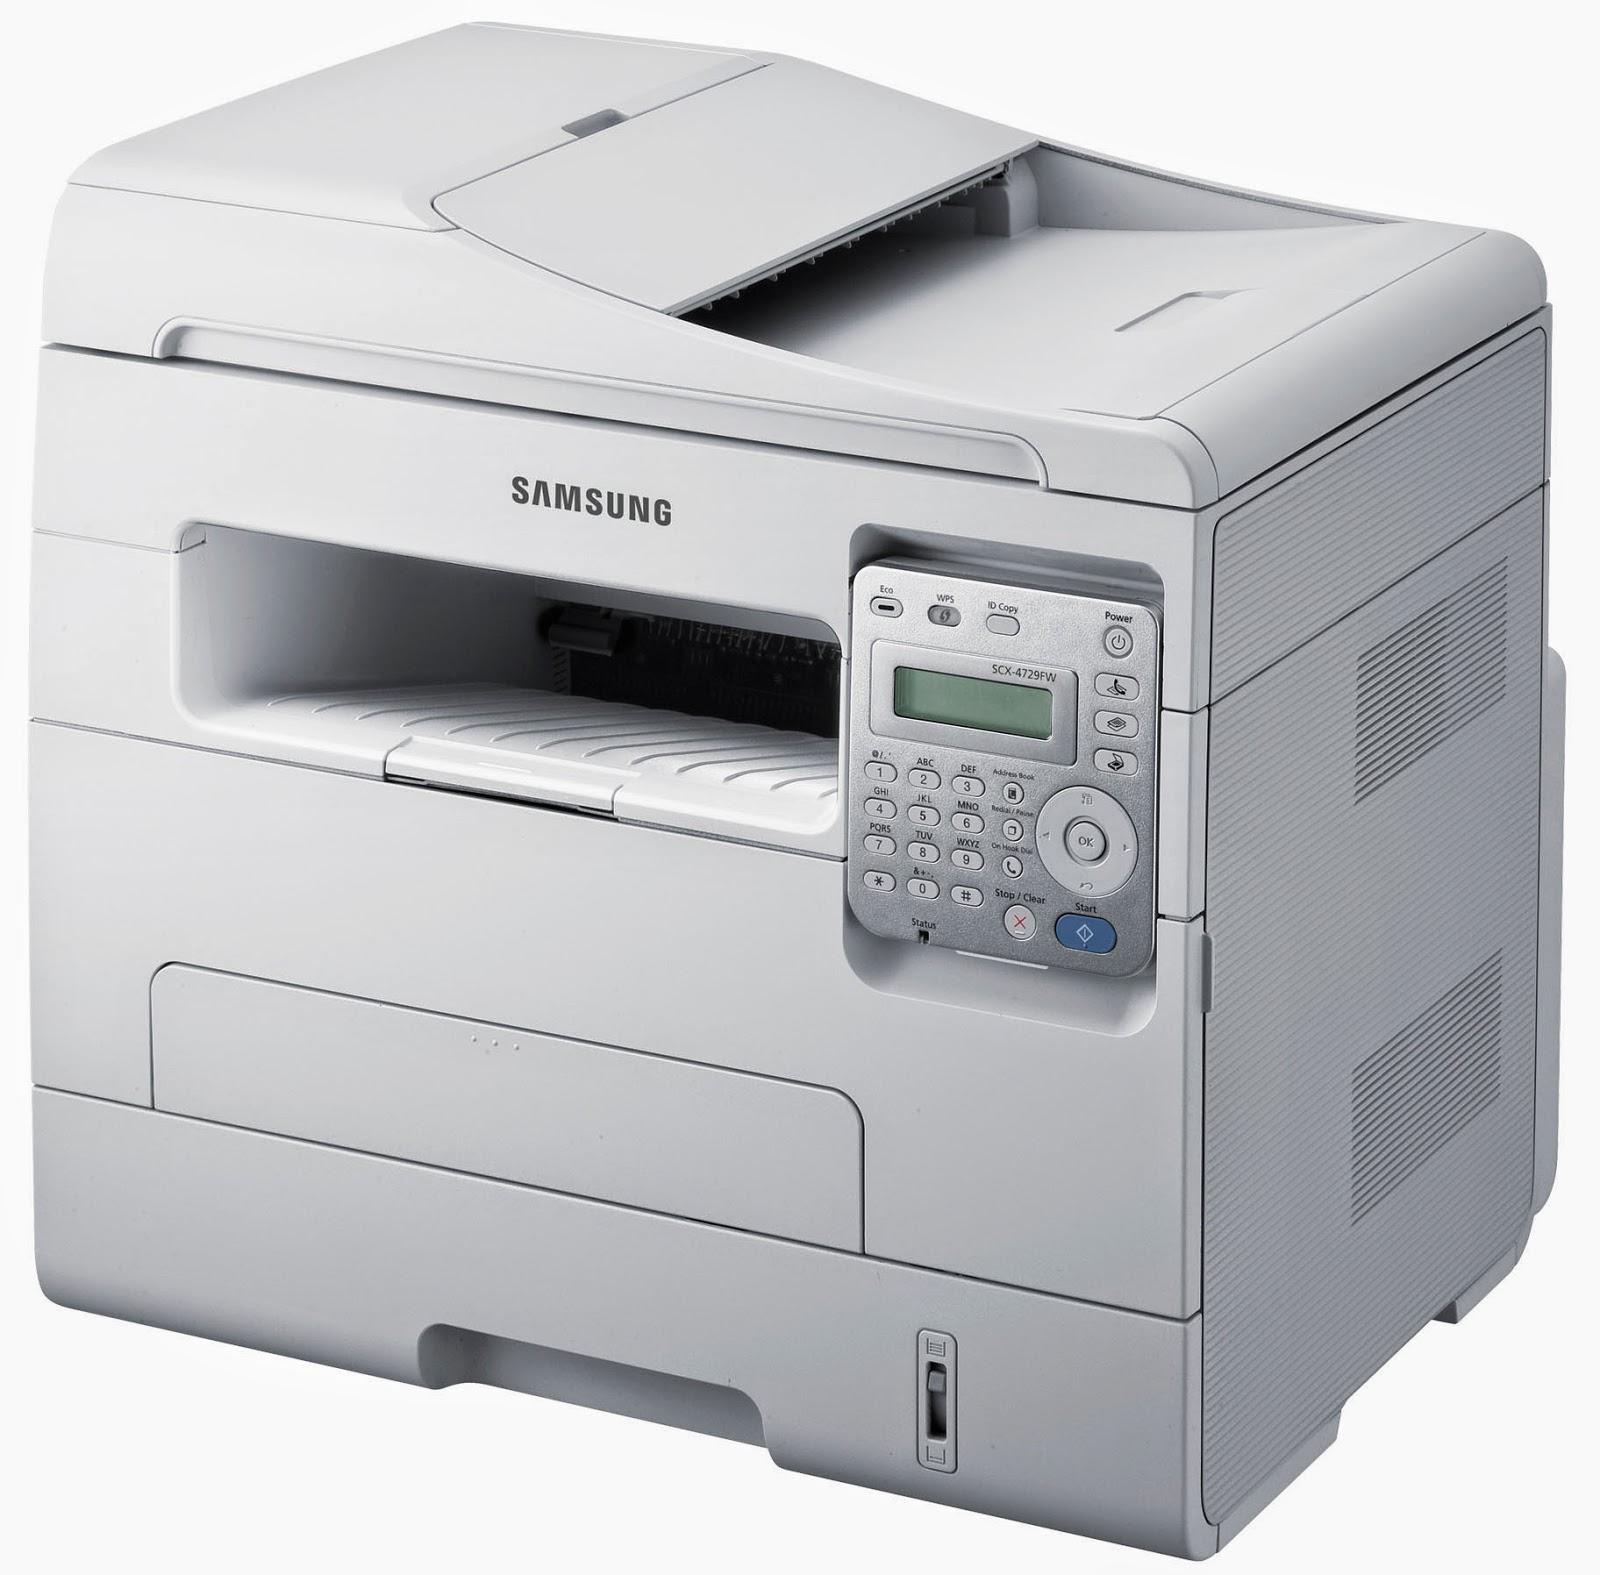 Принтер Samsung SCX-4729FW